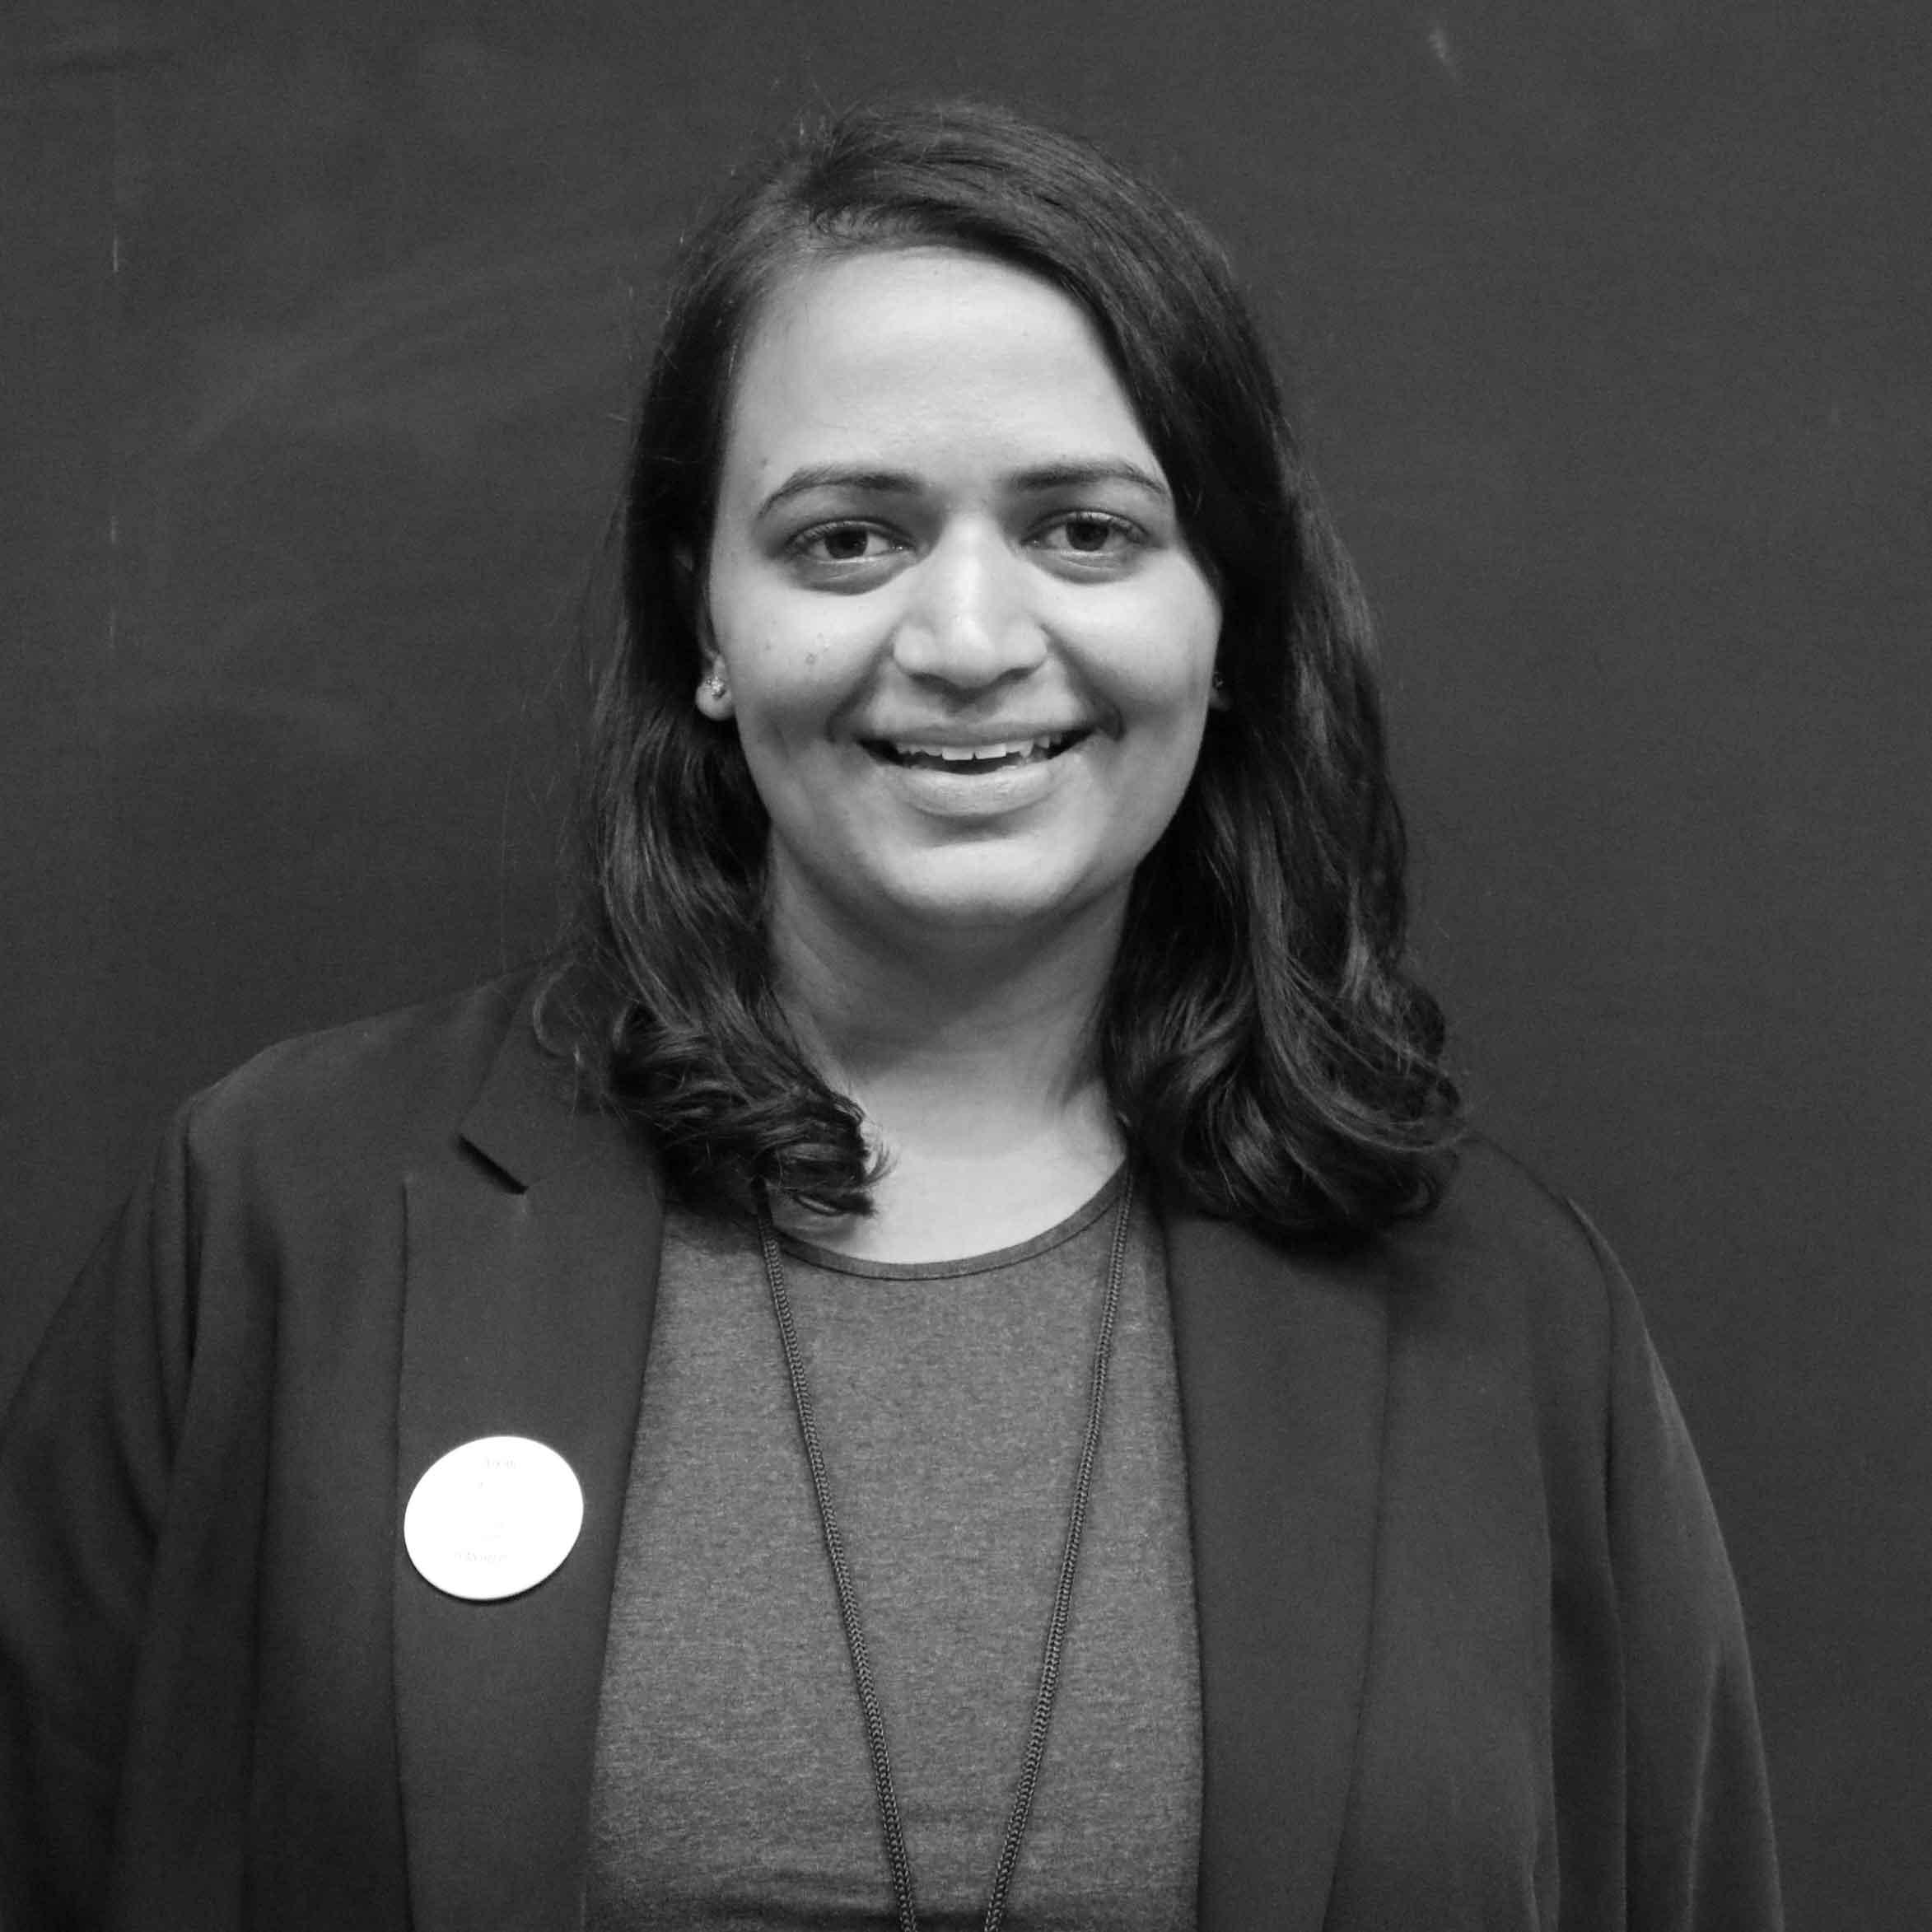 Nerali Patel • Johannesburg, South Africa  Master in Urban Planning '18 • Harvard Graduate School of Design